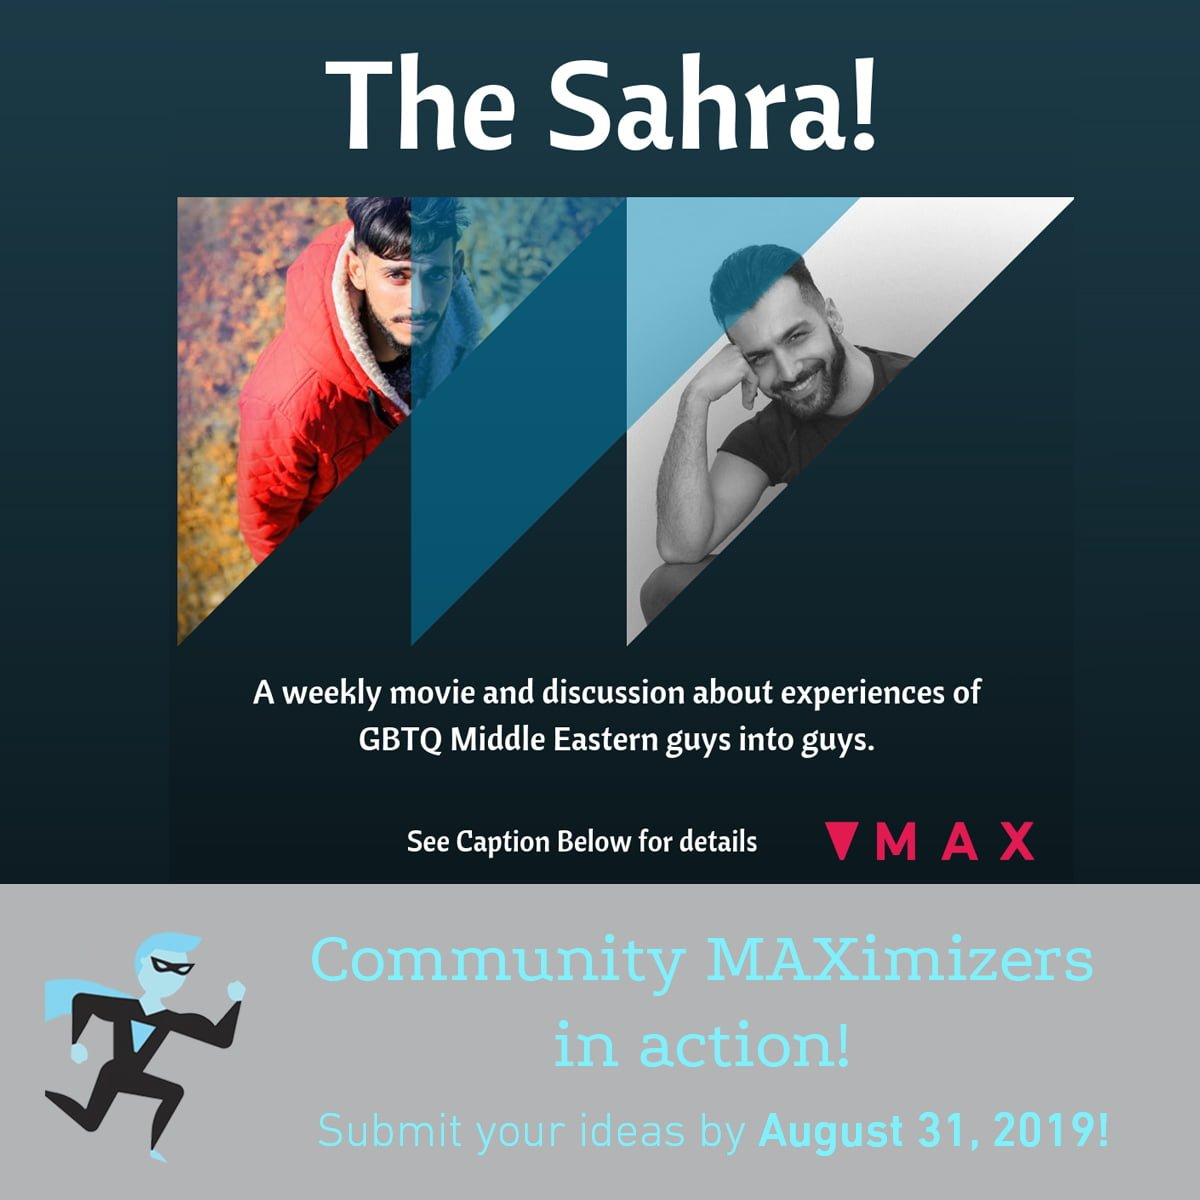 The Sahra poster for Community MAXimizer Program